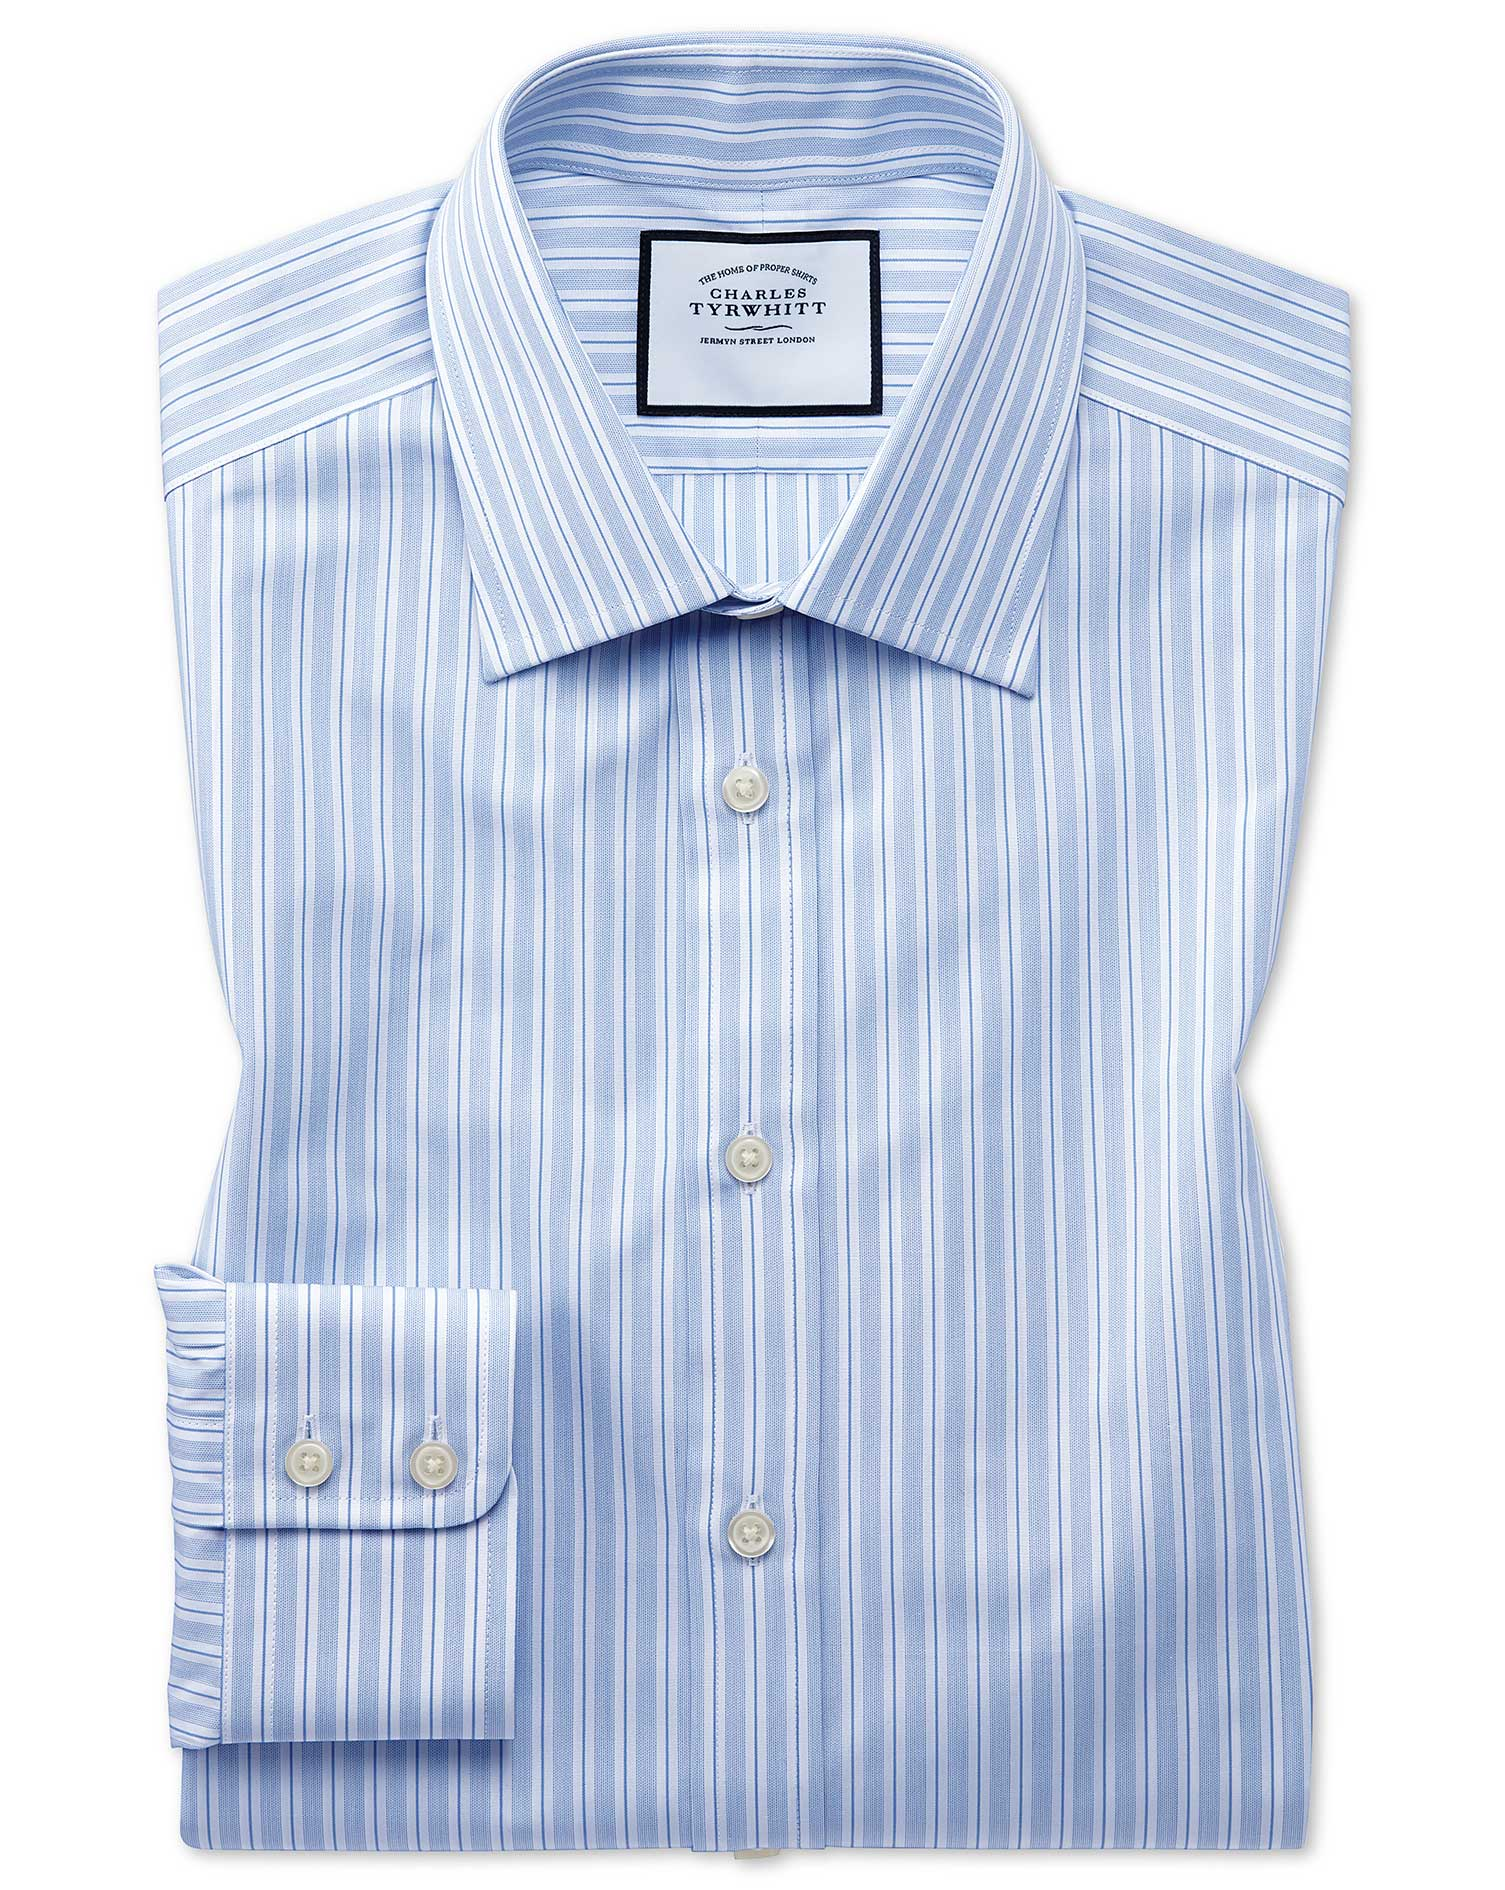 Slim Fit Egyptian Cotton Poplin Sky Blue Stripe Formal Shirt Single Cuff Size 16.5/36 by Charles Tyr